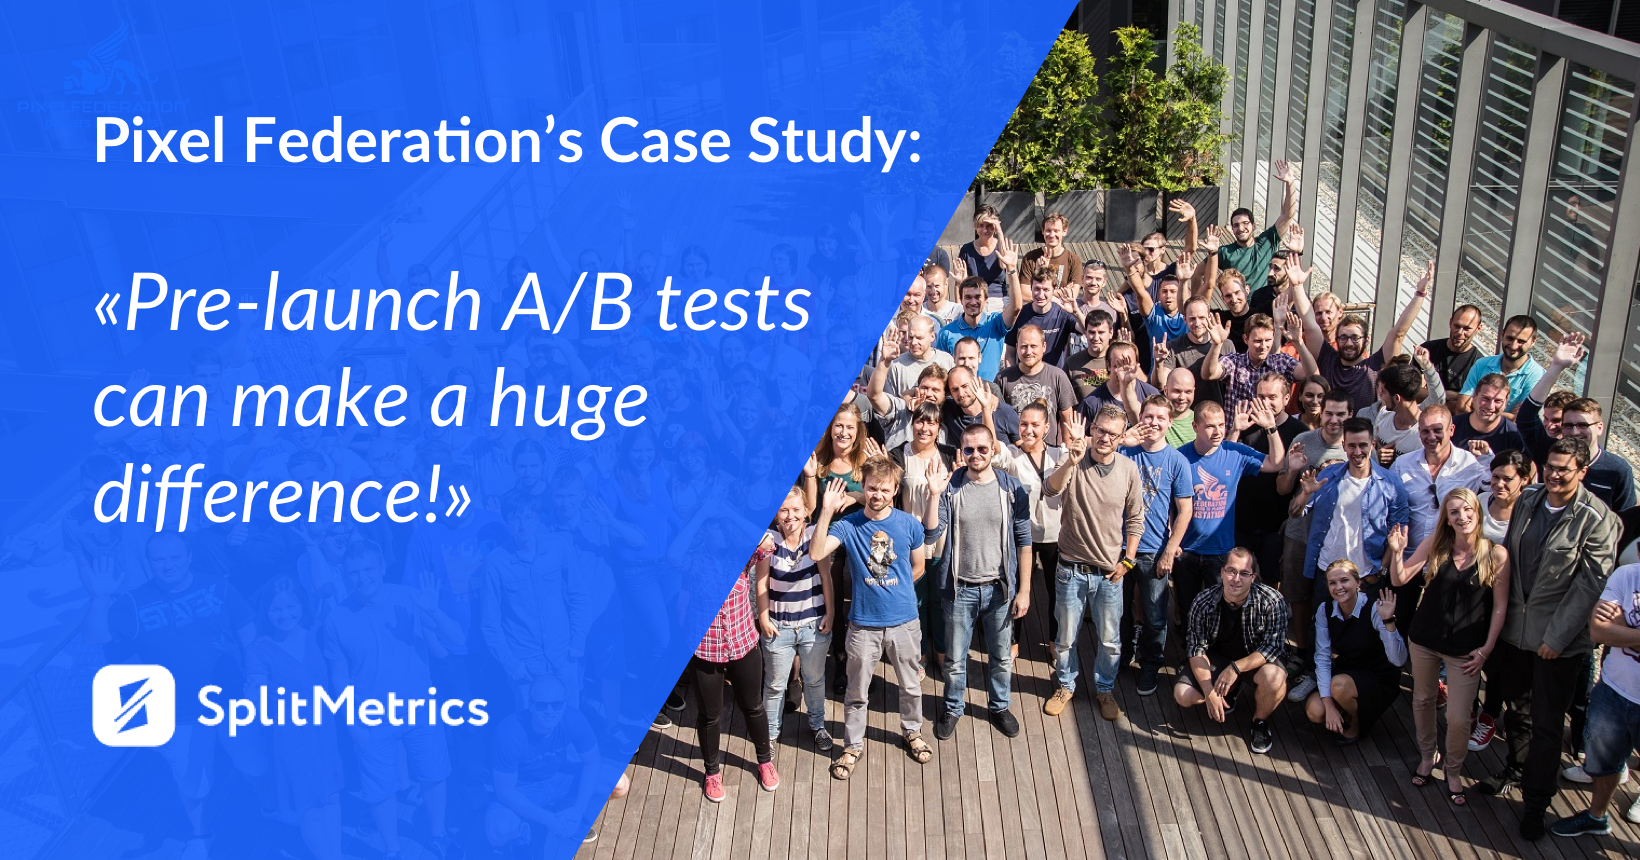 prelaunch ab testing case study splitmetrics main